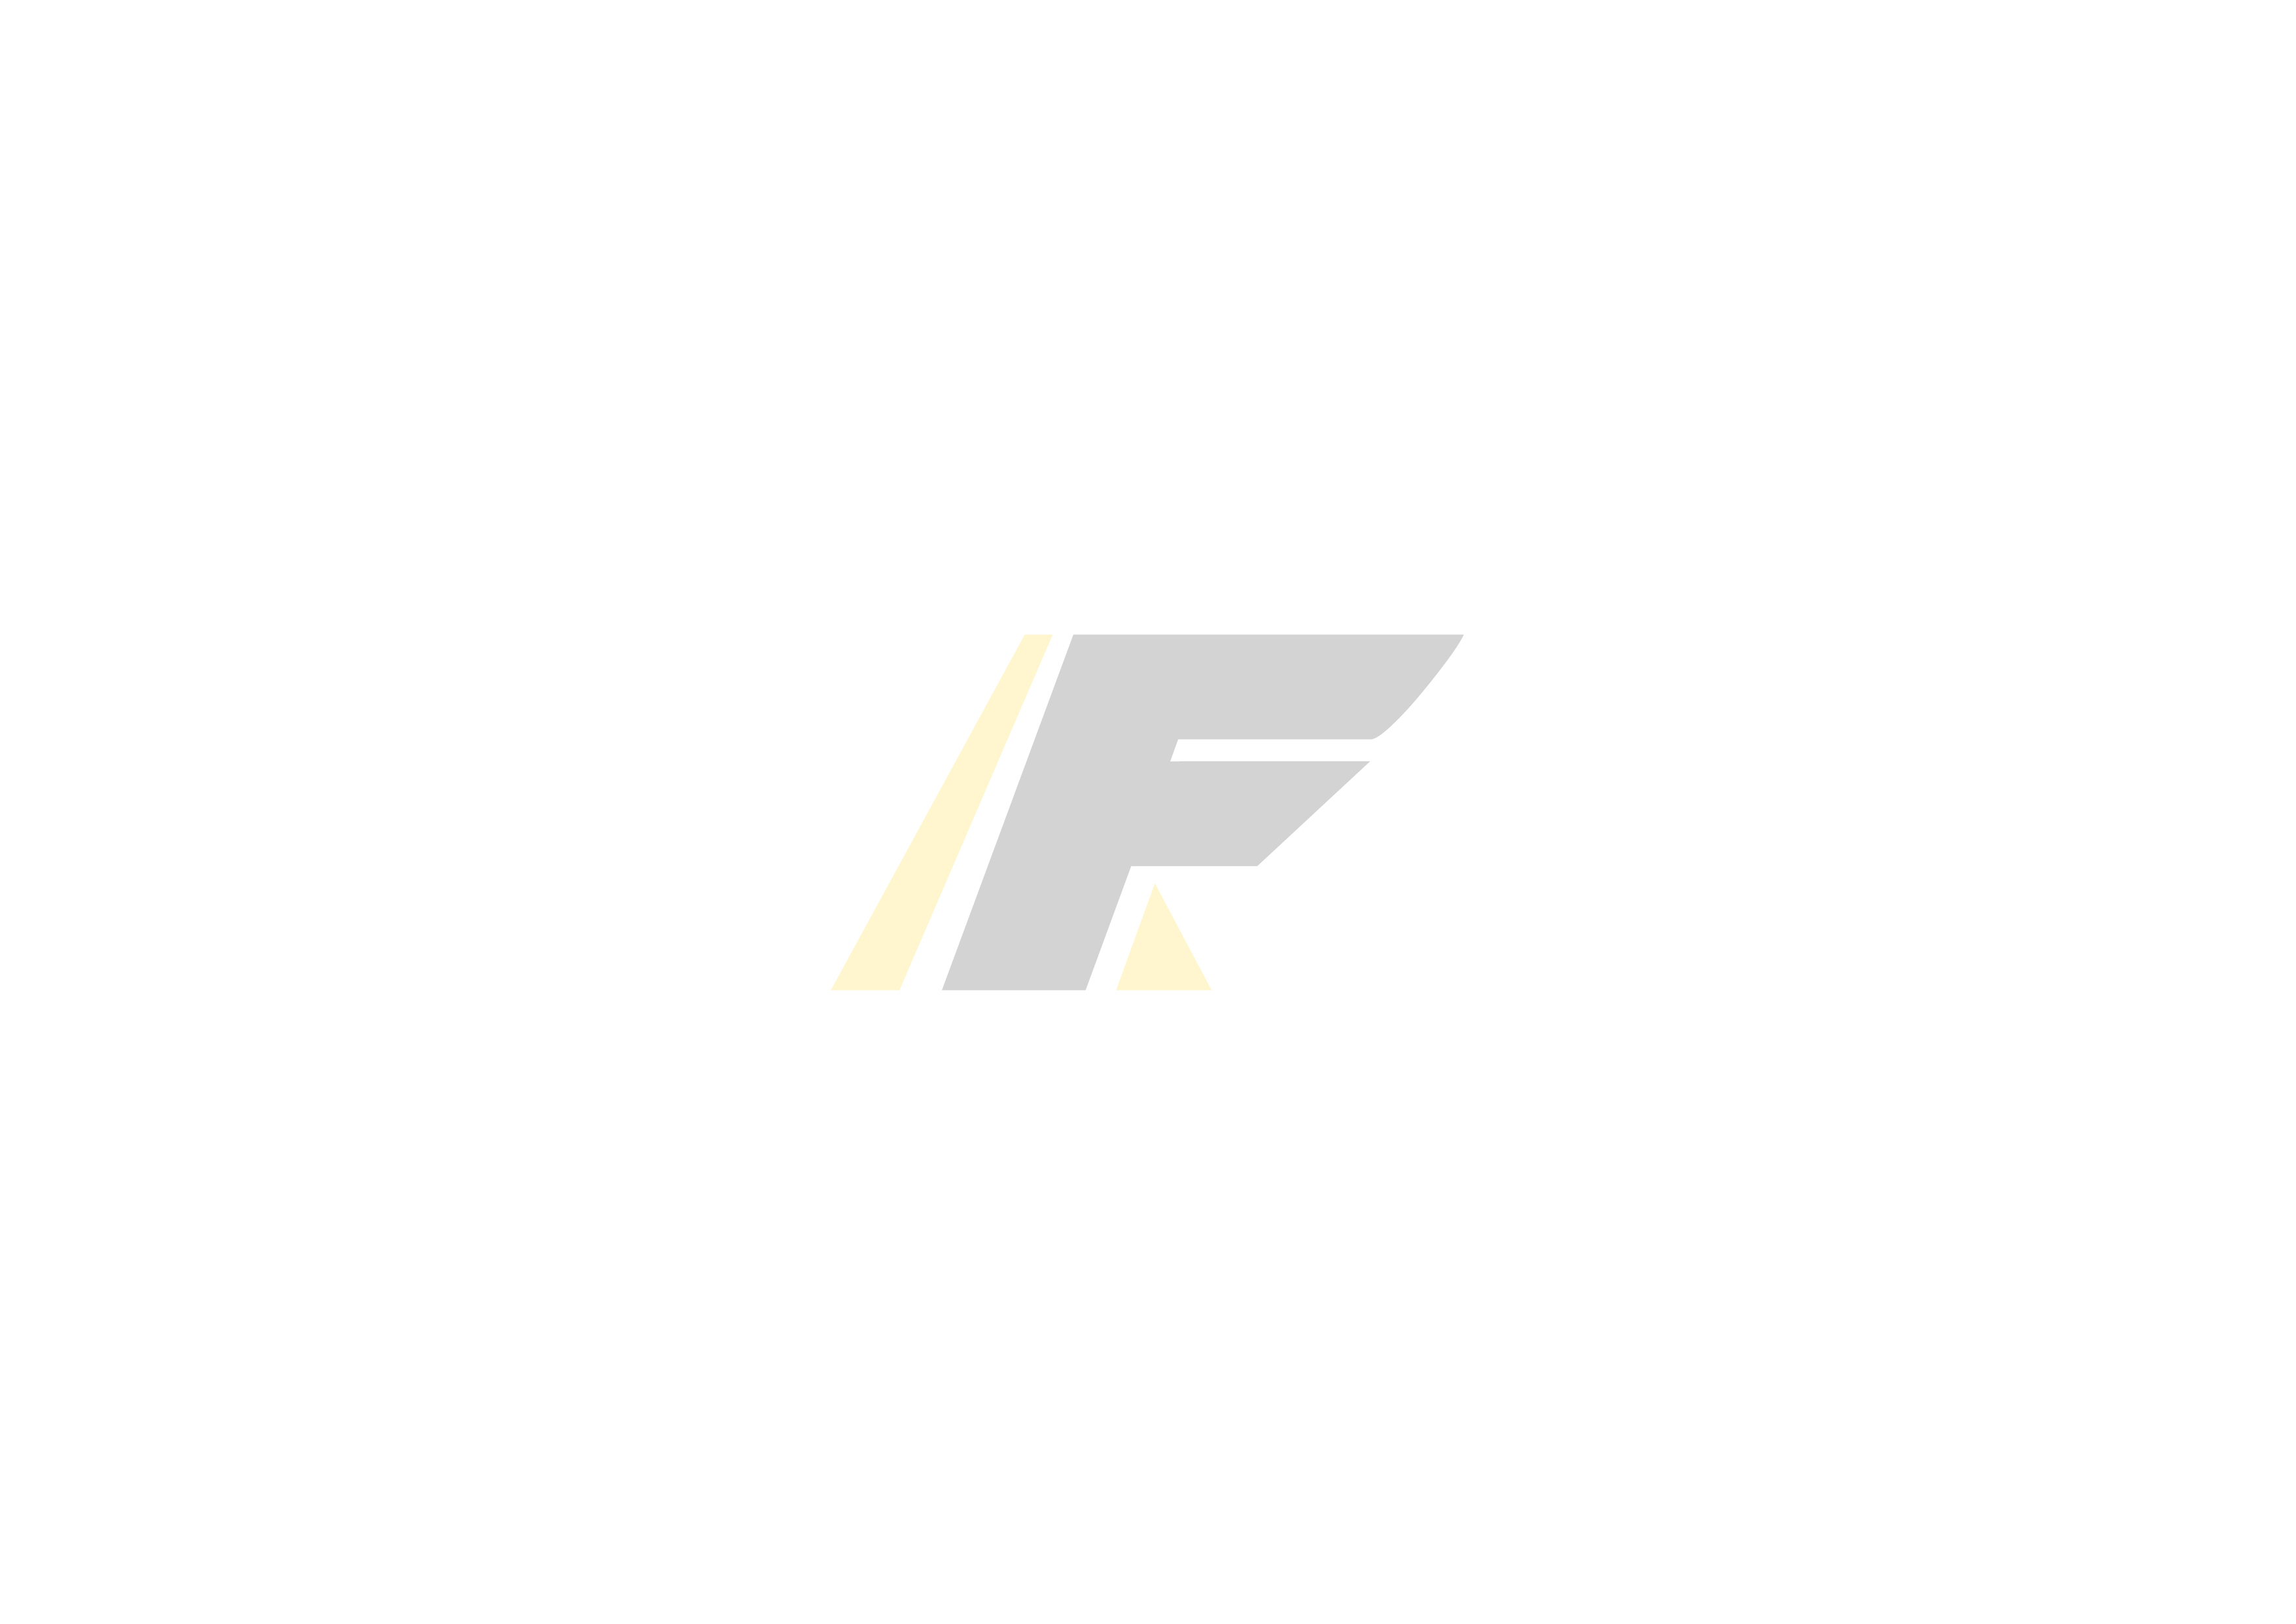 R&G Fork Protectors - KTM 125/200/390 Duke, RC125/200/390